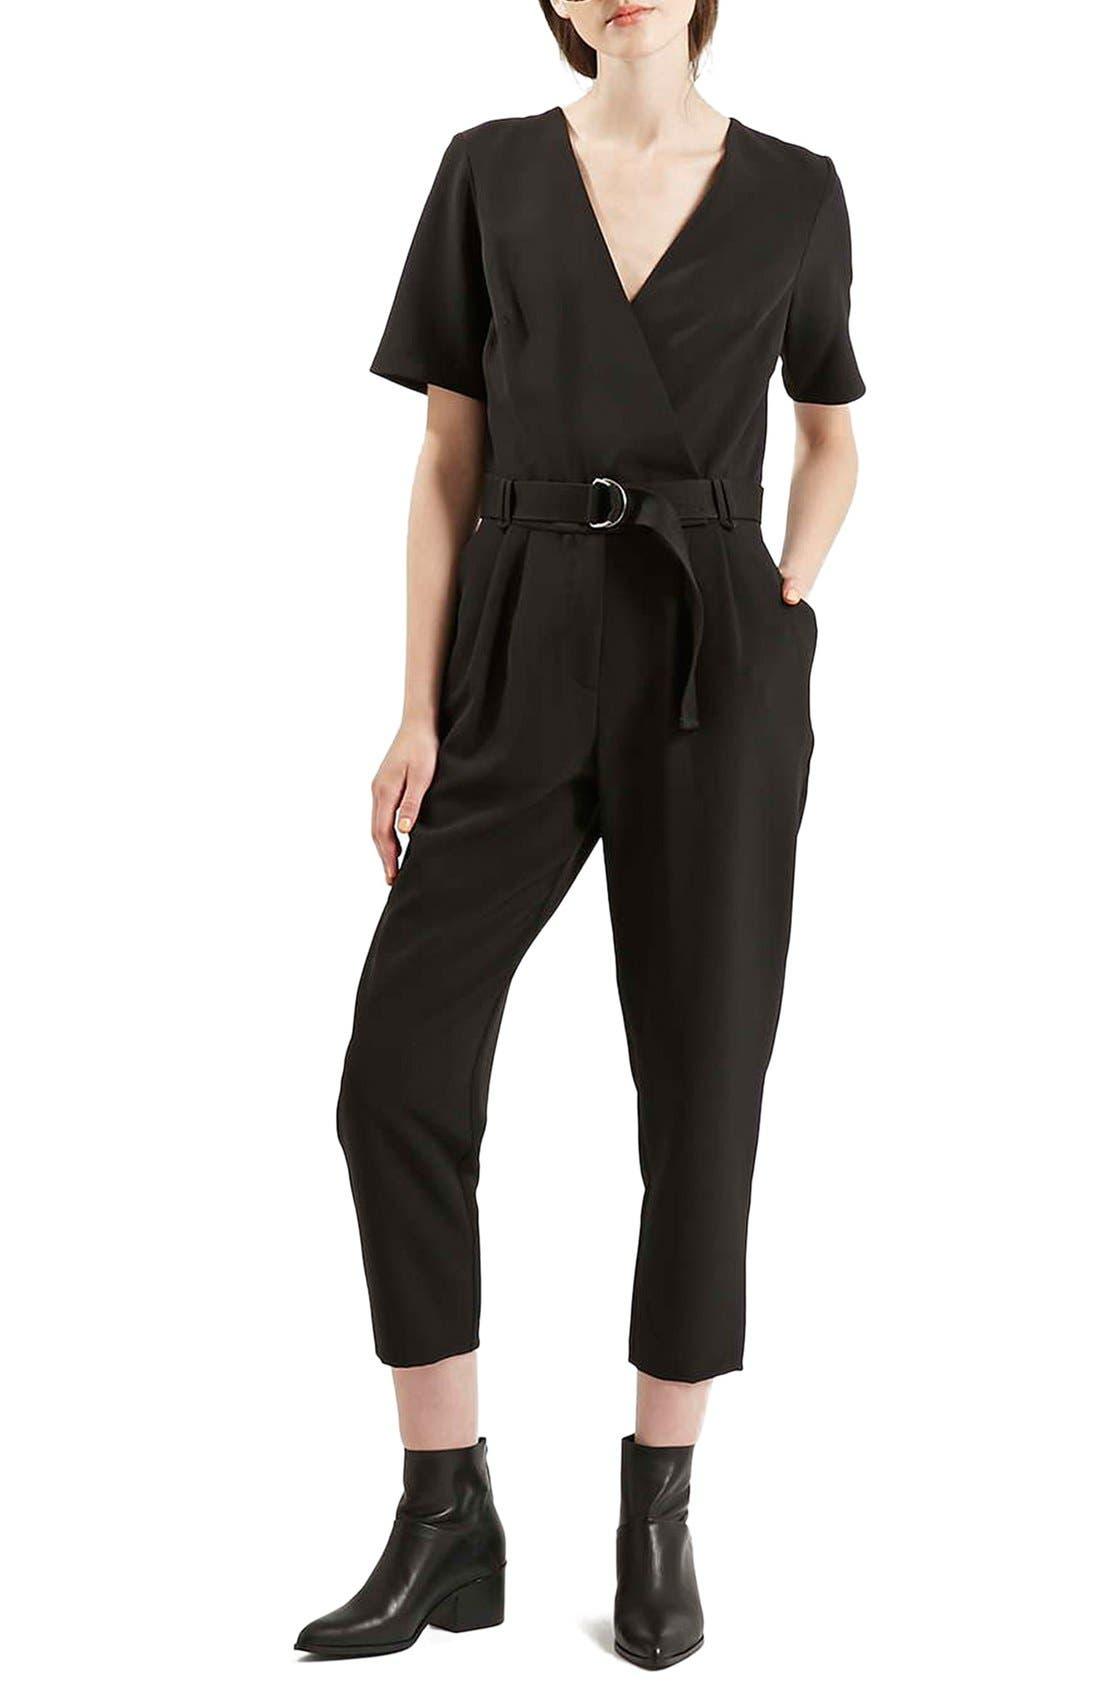 Alternate Image 1 Selected - Topshop Belted Jumpsuit